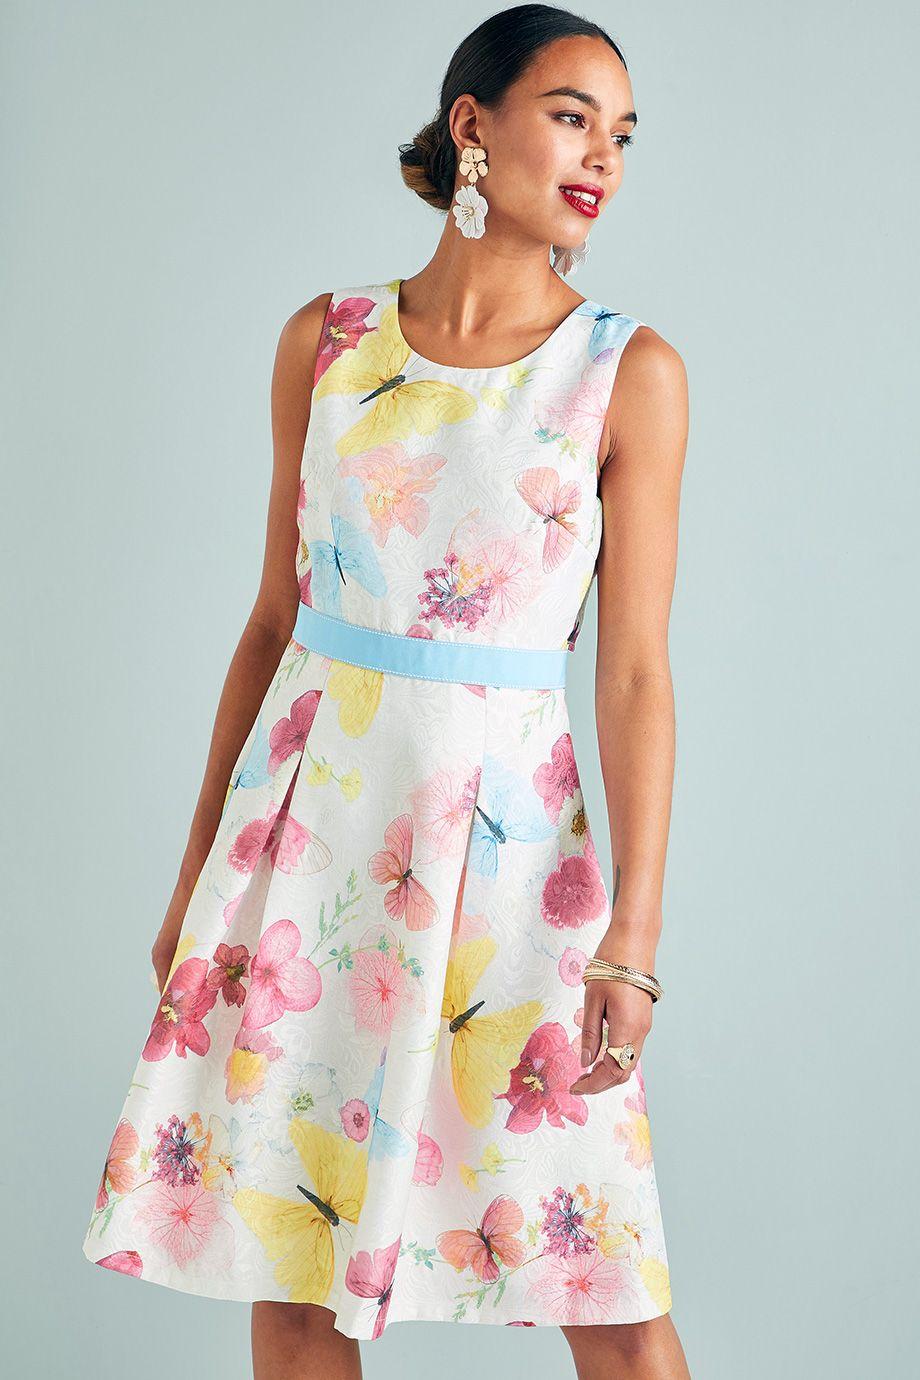 a8149ff3b5e Λευκο φορεμα απο μπροκαρ υφασμα με πεταλουδες, σιελ κορδελα στη μεση ...